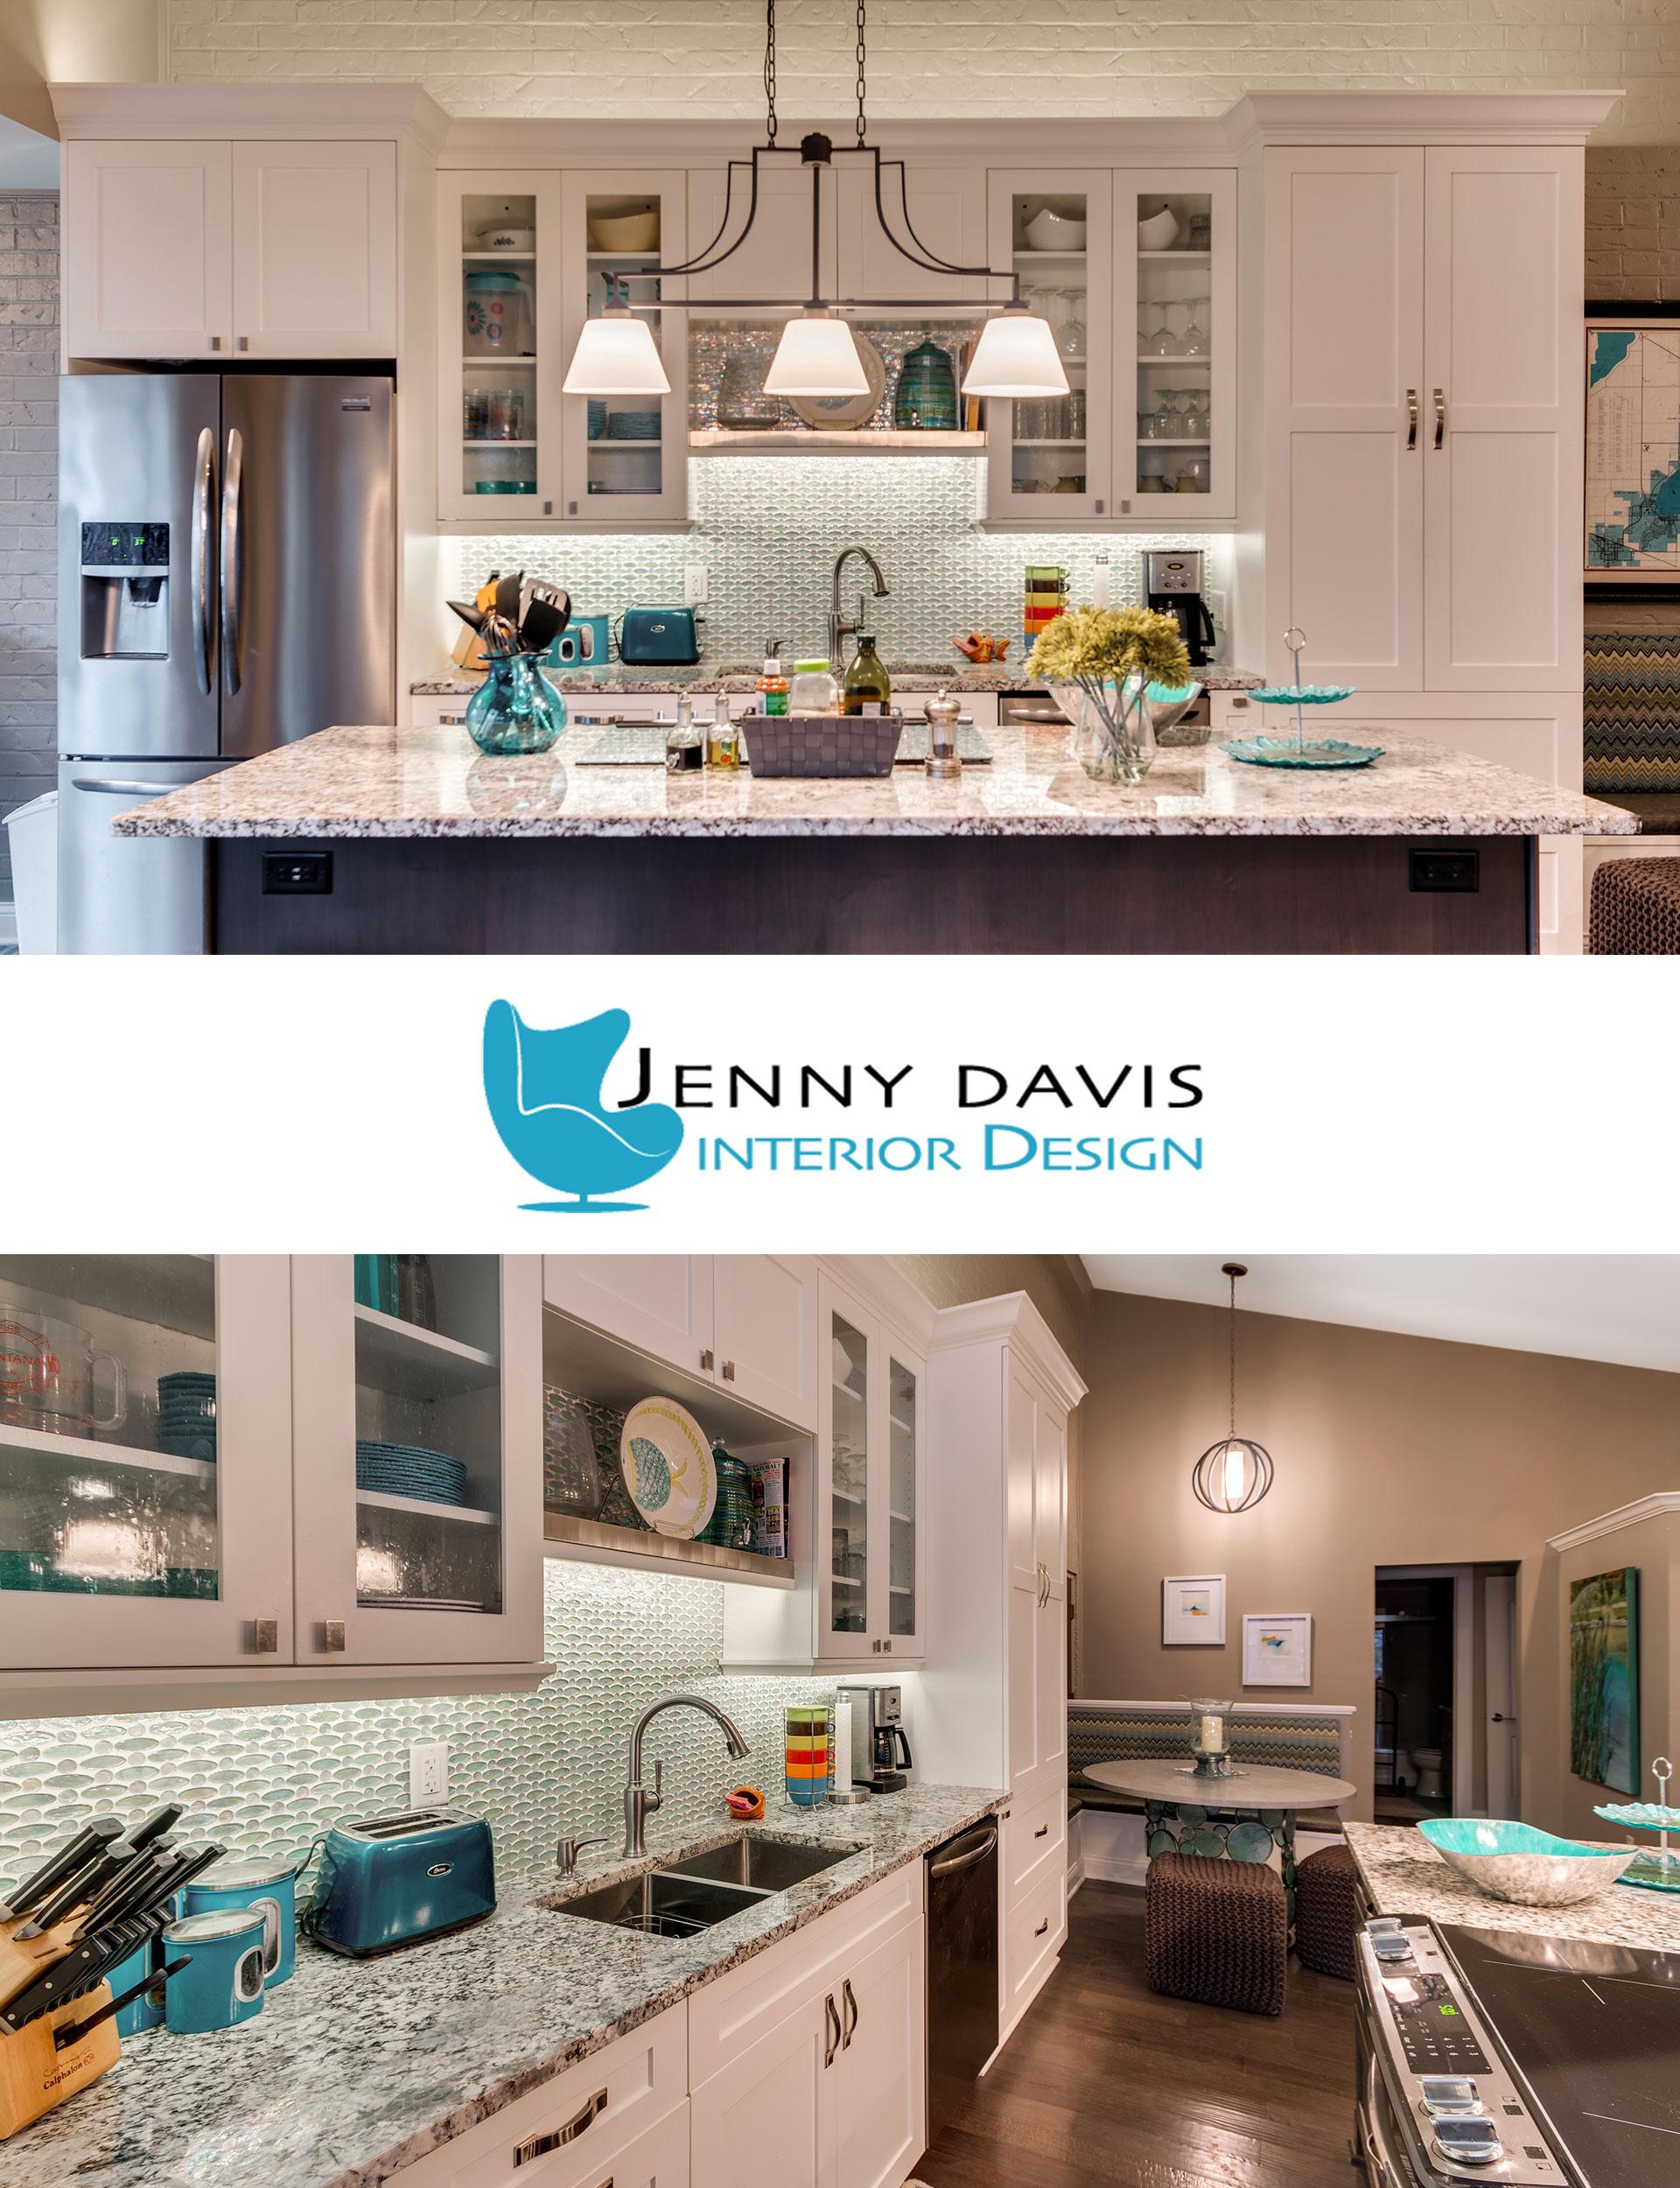 jenny davis interior design chicago